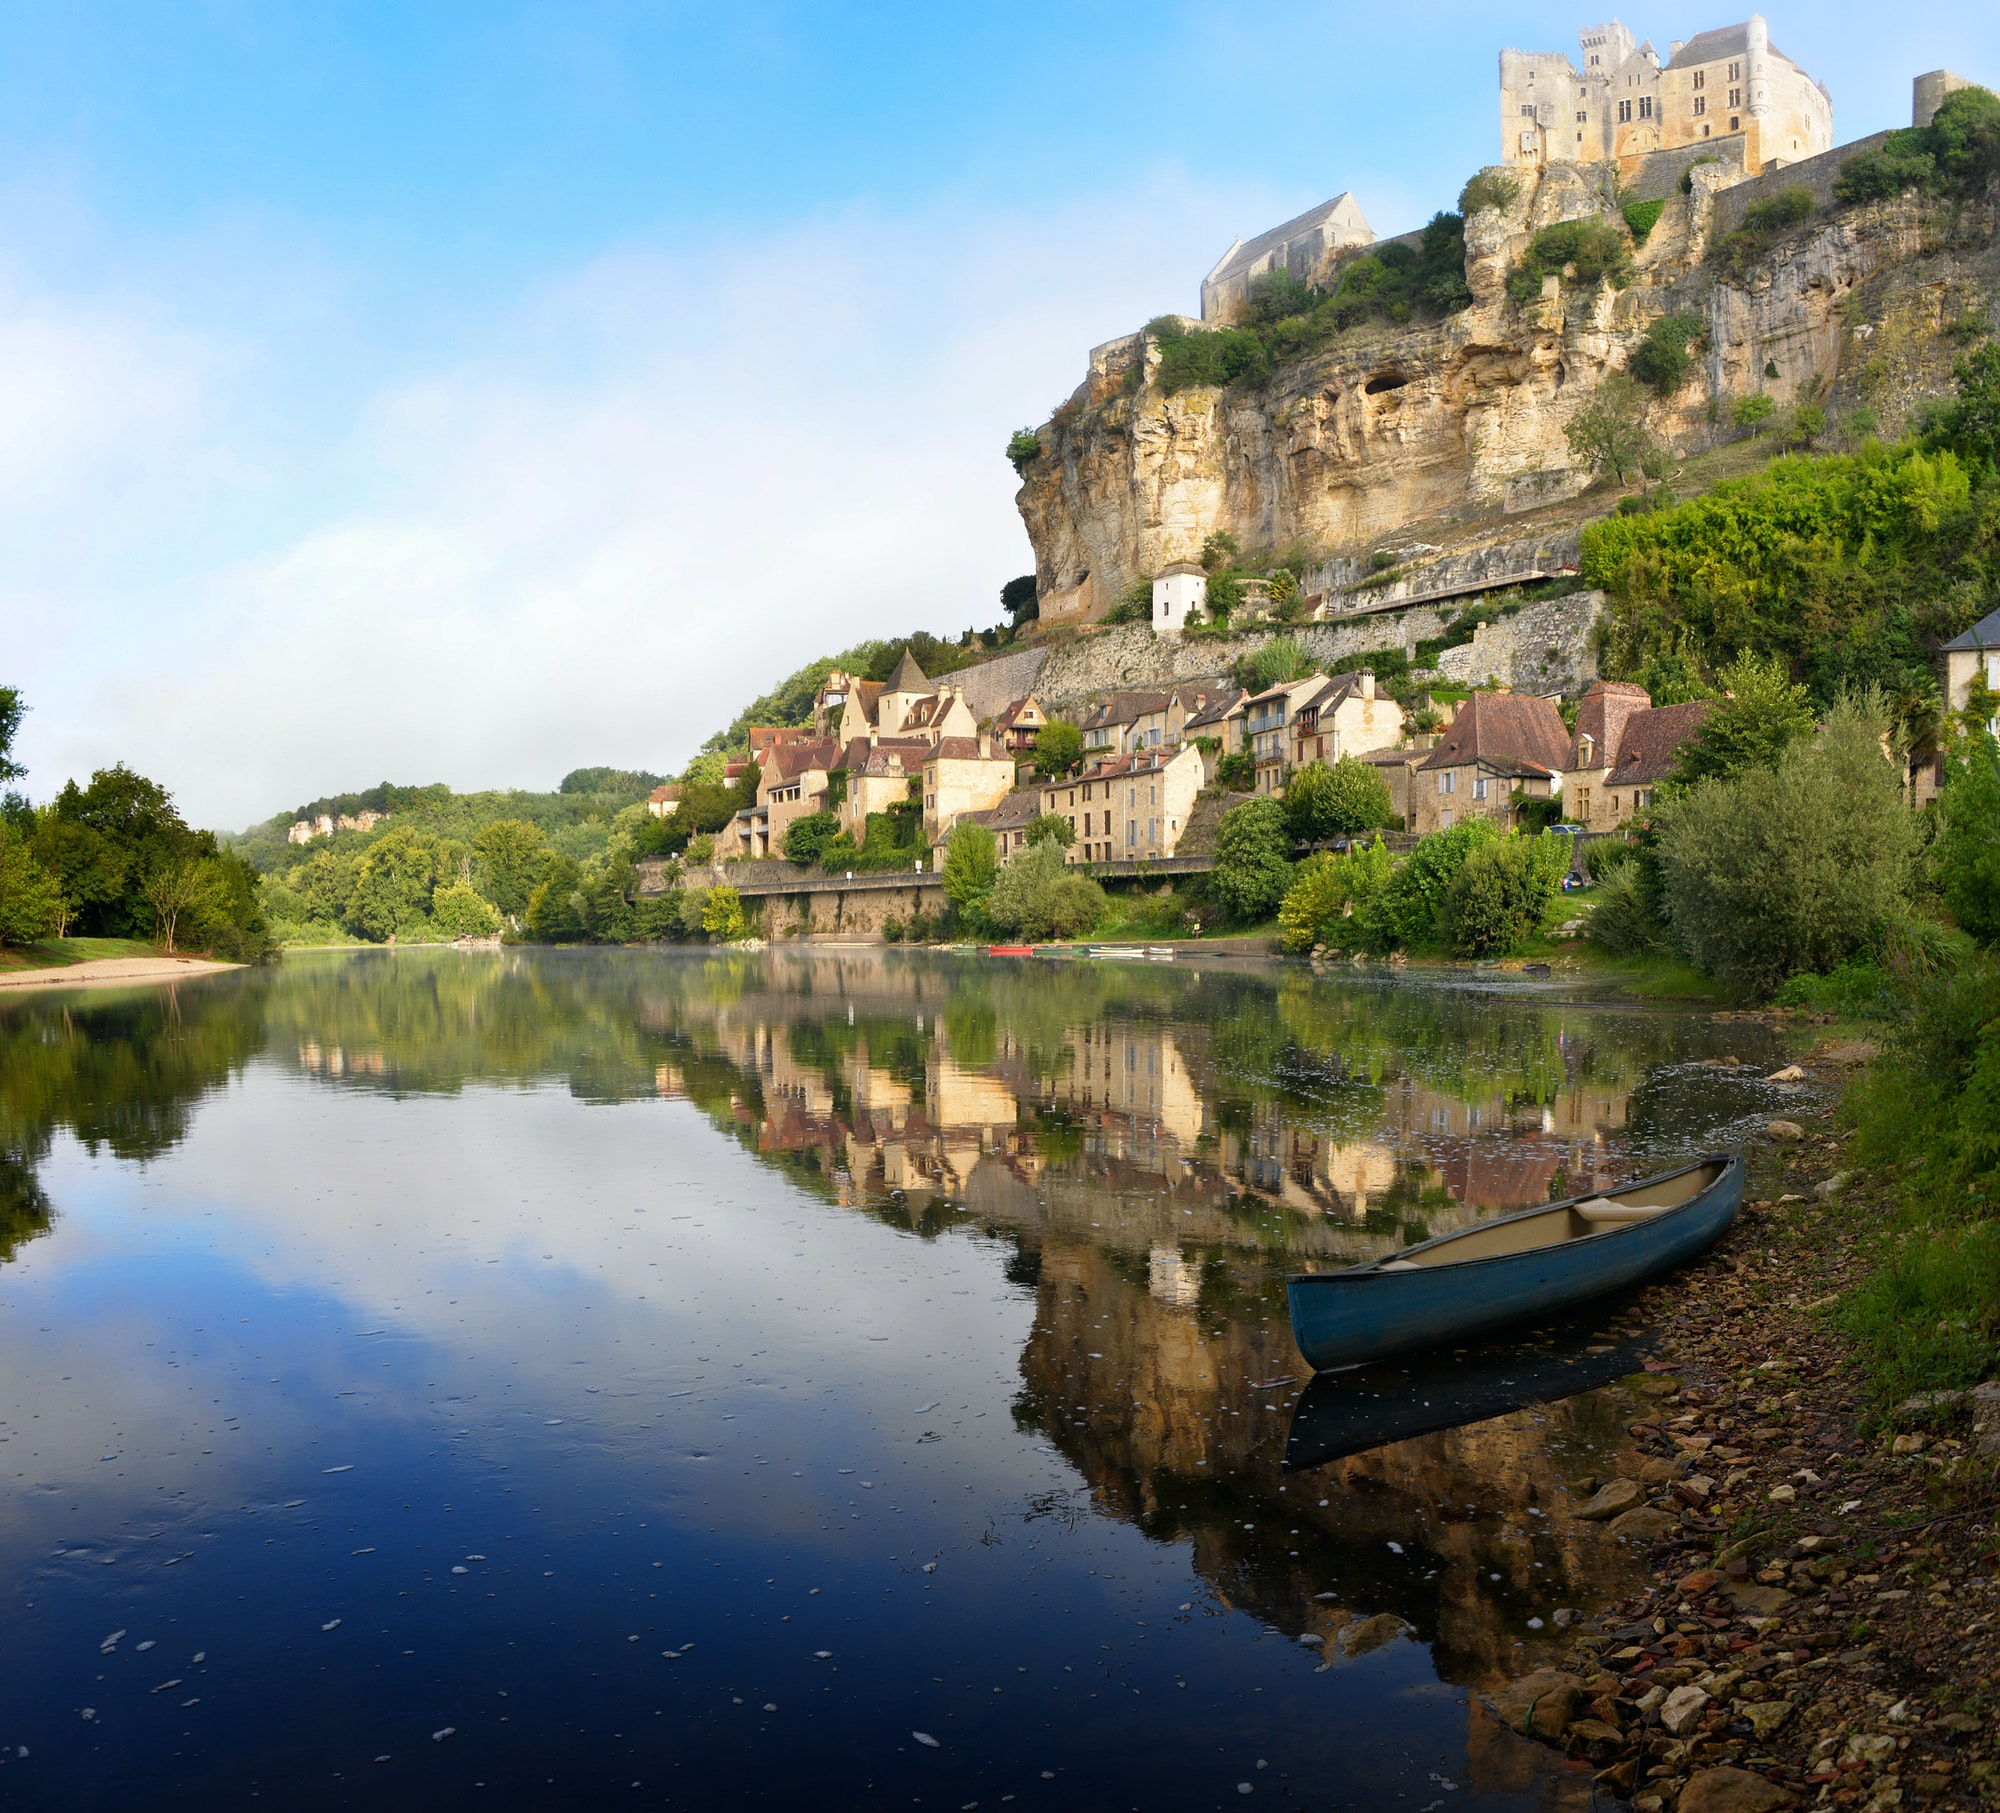 Beynac-et-Cazenac village along Dordogne river